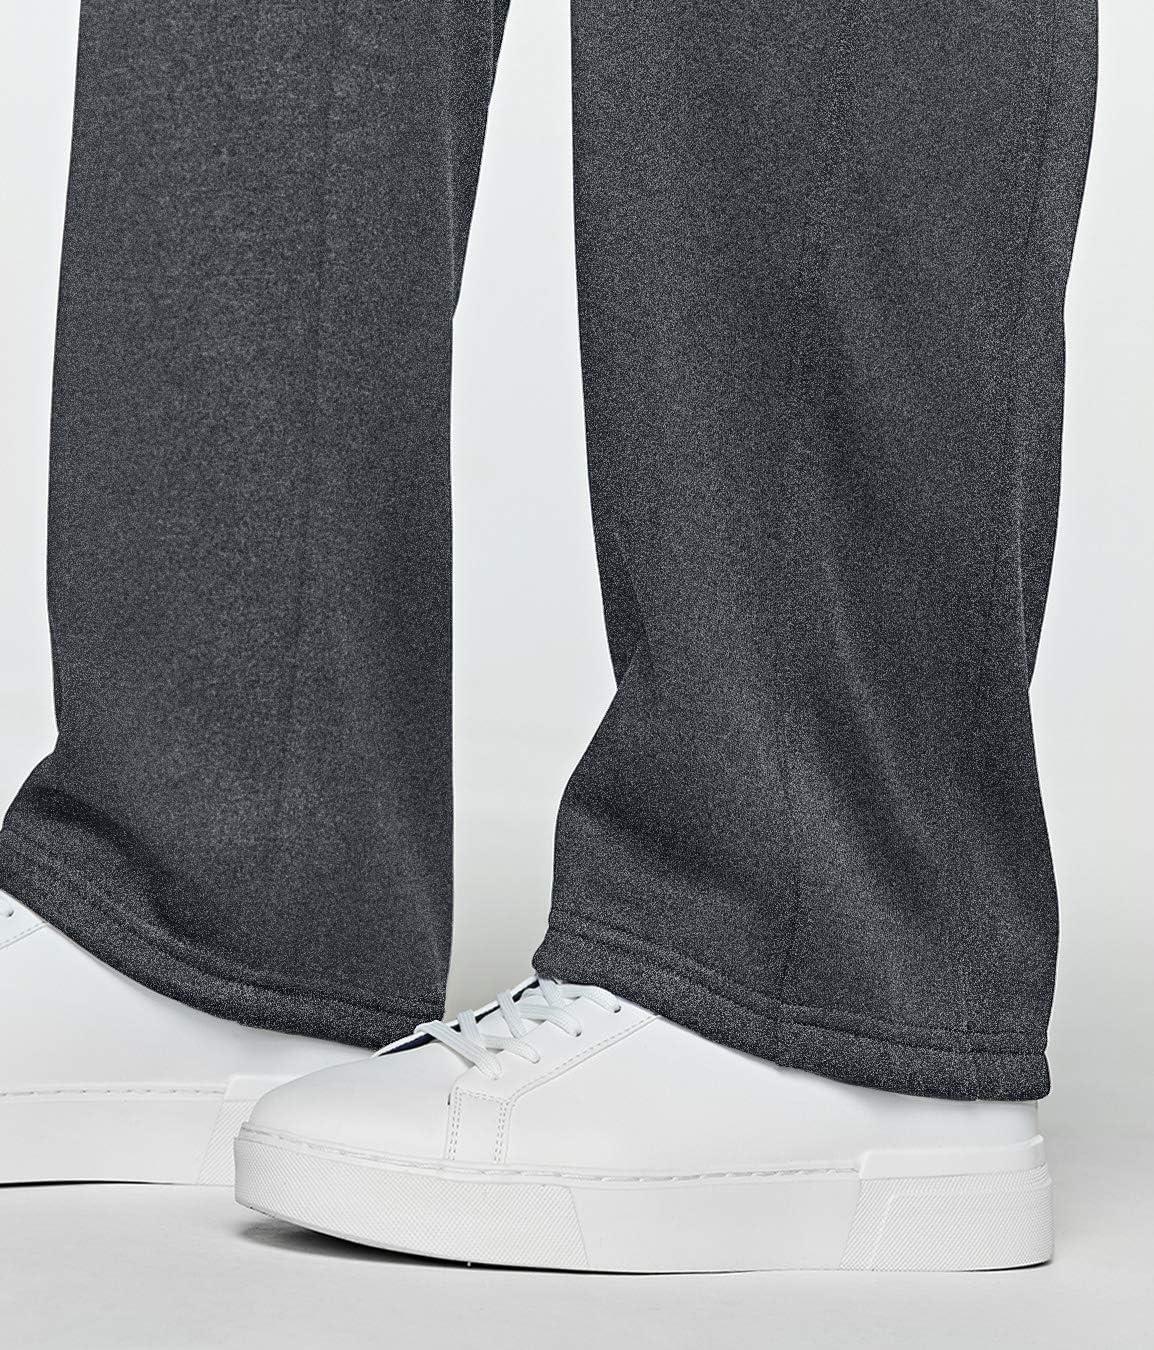 TSLA Mens Fleece Yoga Sweatpants Open Bottom Straight Leg Running Casual Loose Fit Athletic Pants with Pockets